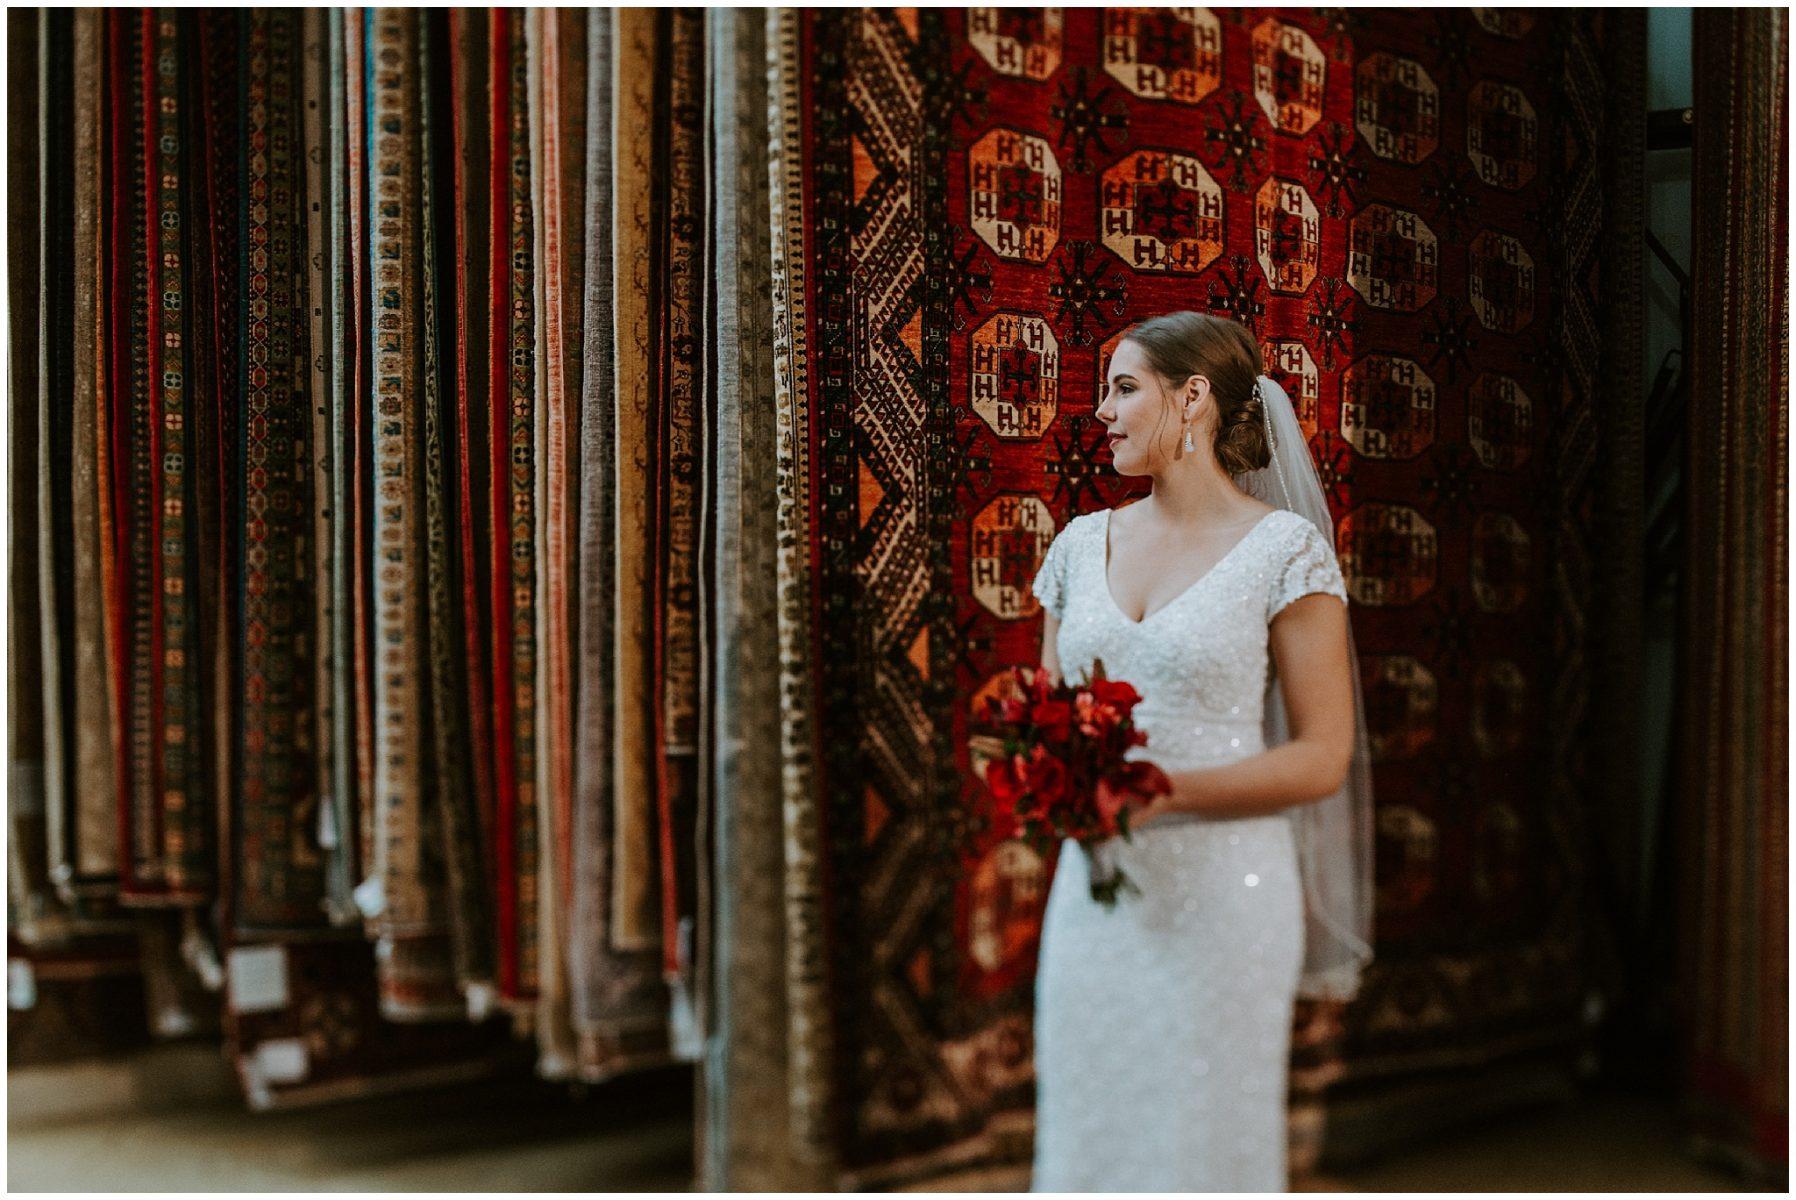 Material Culture Wedding Photographer, Philadelphia East Falls